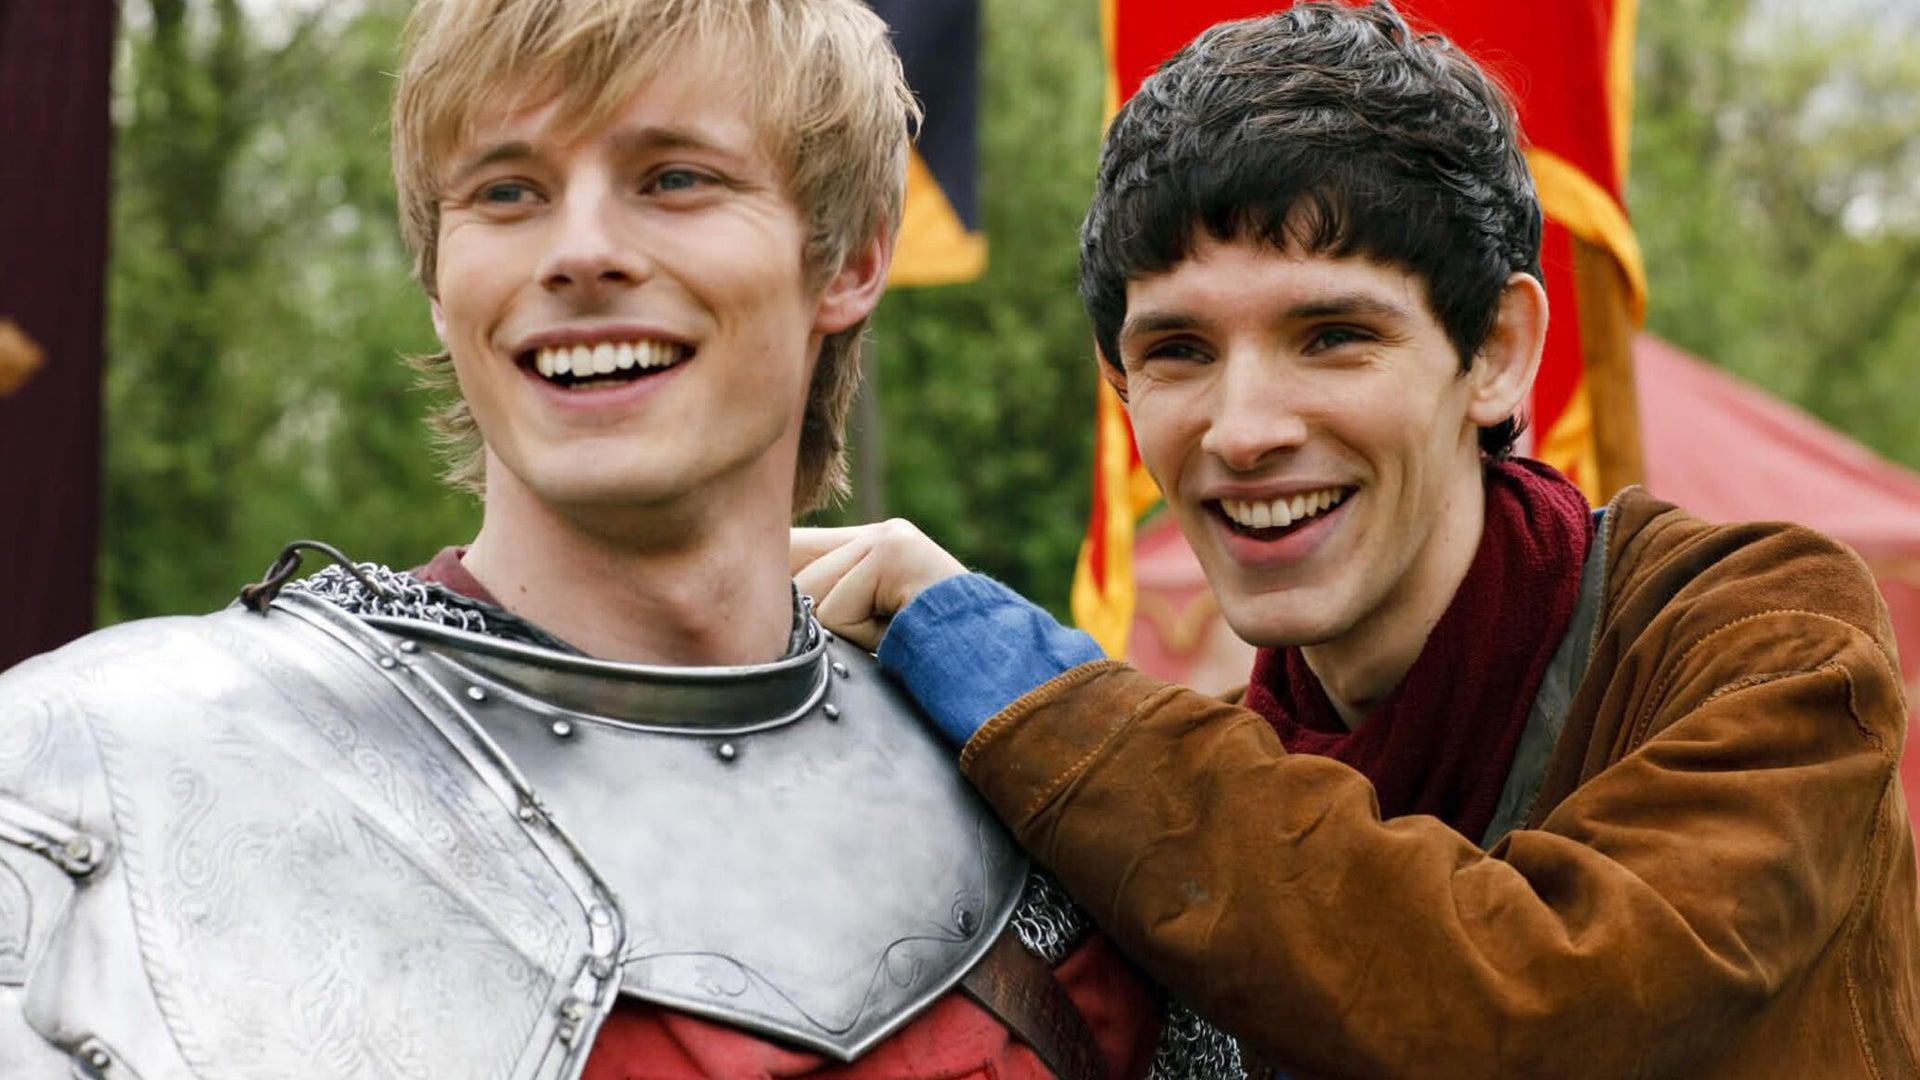 Bradley James and Colin Morgan, Merlin